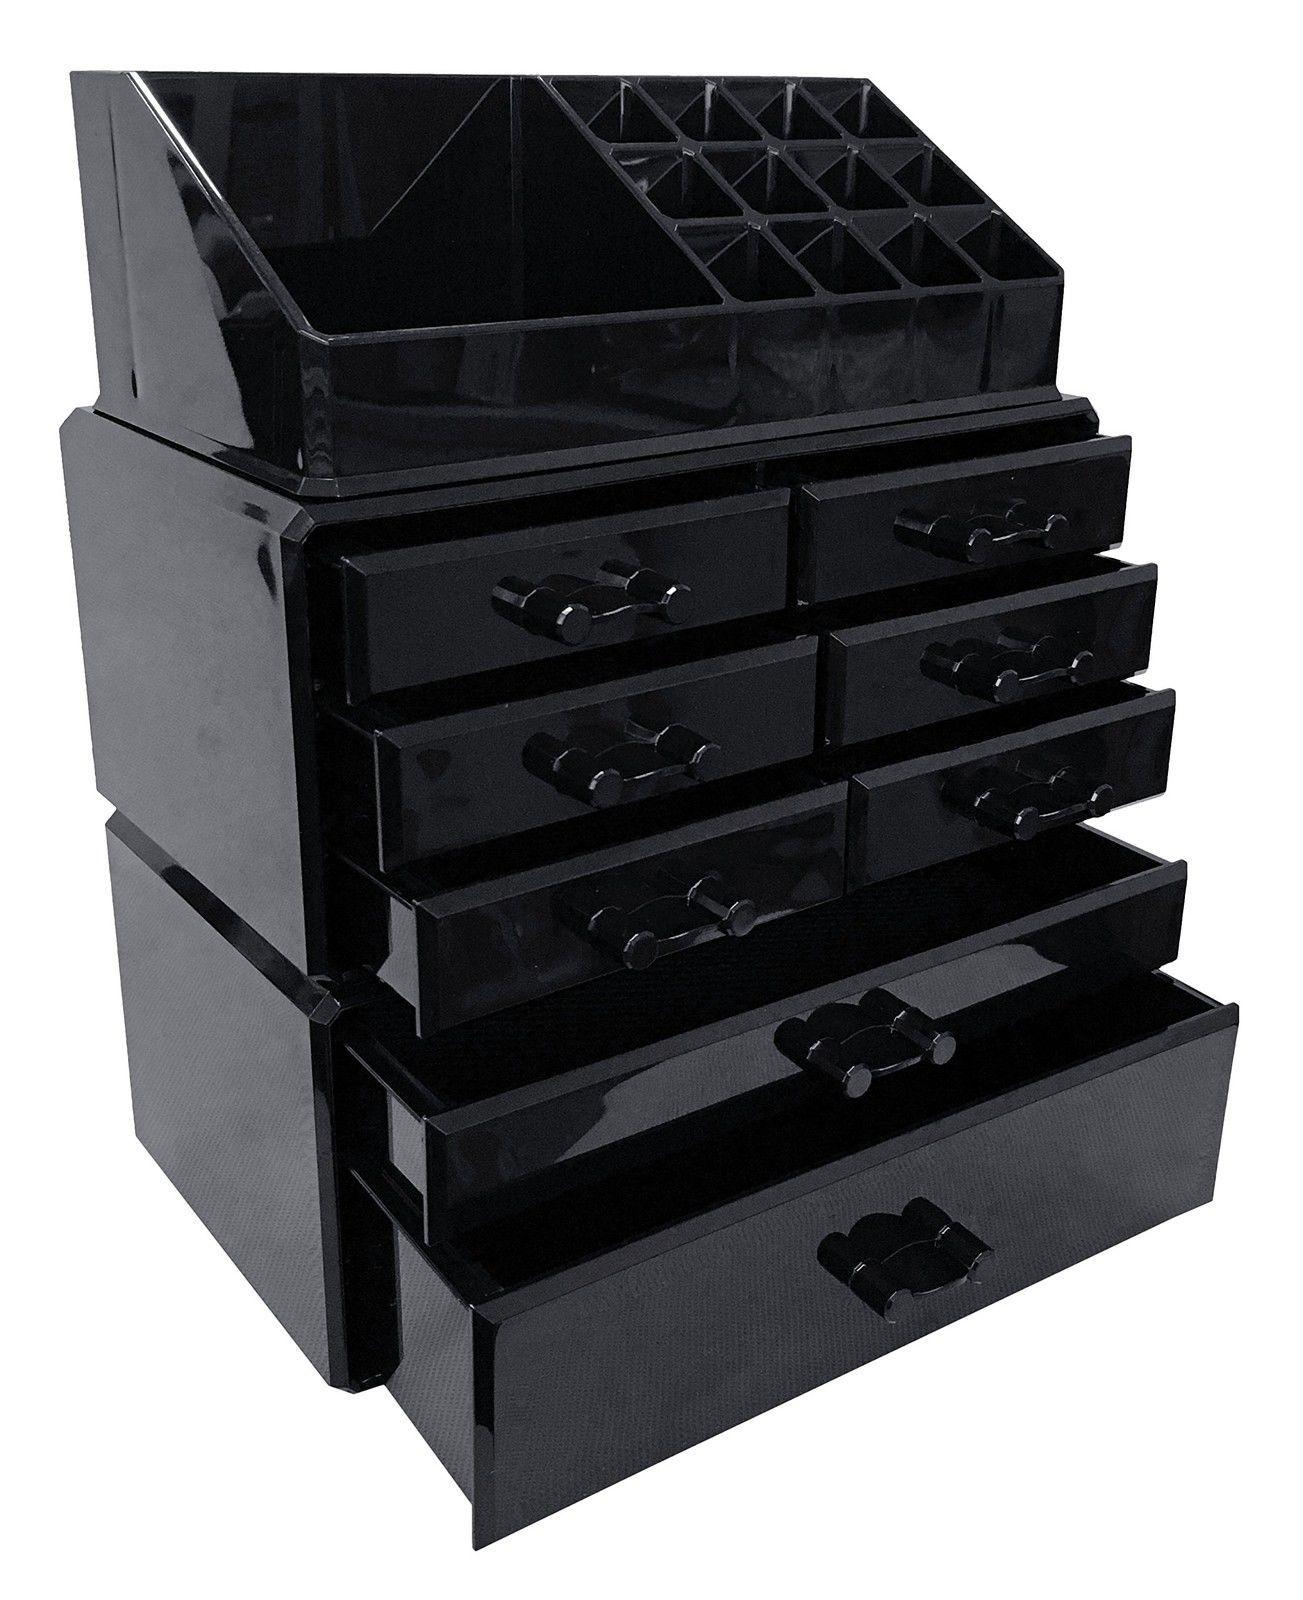 Black Acrylic Makeup Organizer Drawers Box Ma\u2026